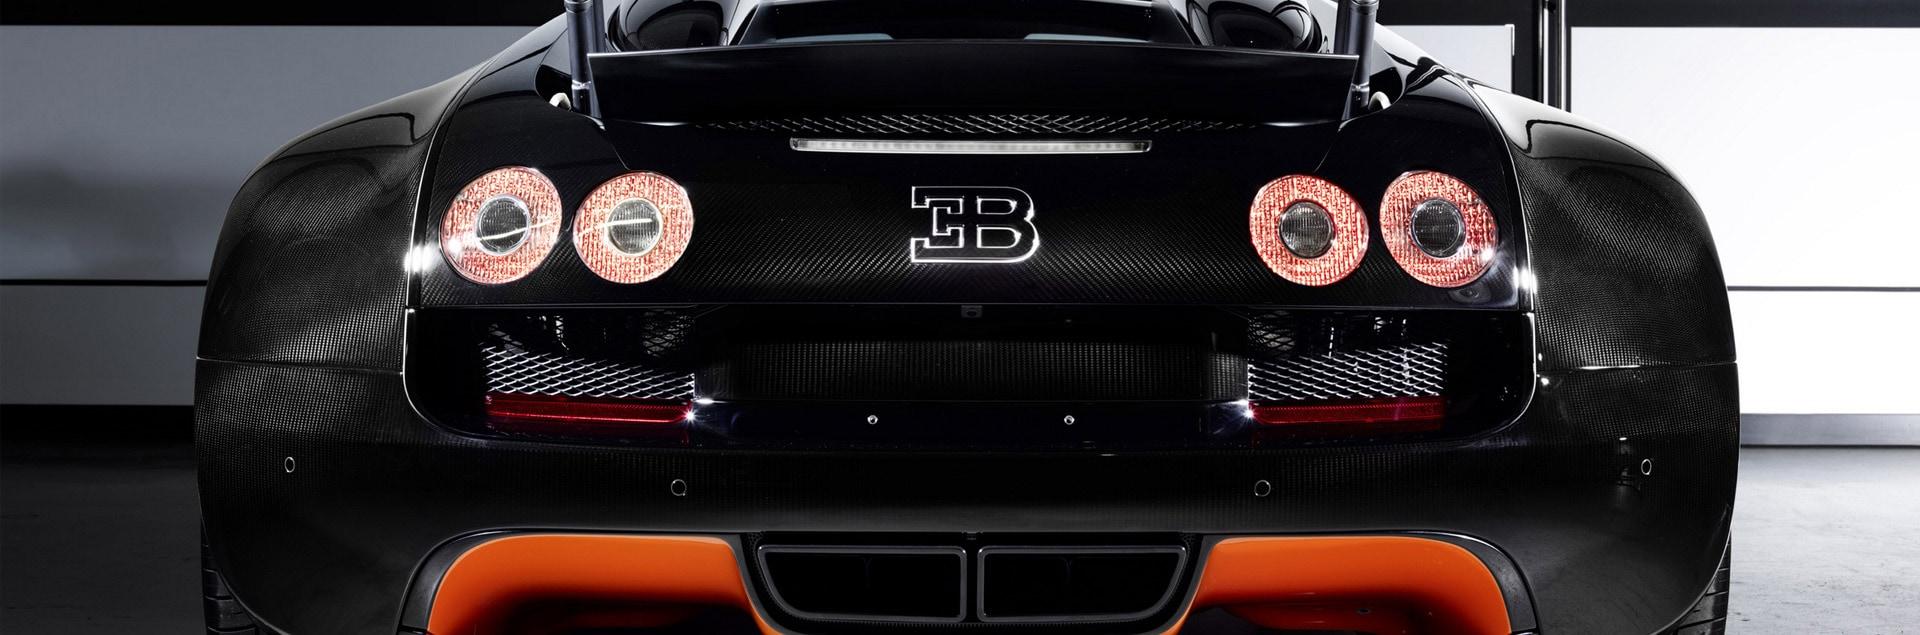 bugatti veyron rental price bugatti veyron grand sport. Black Bedroom Furniture Sets. Home Design Ideas